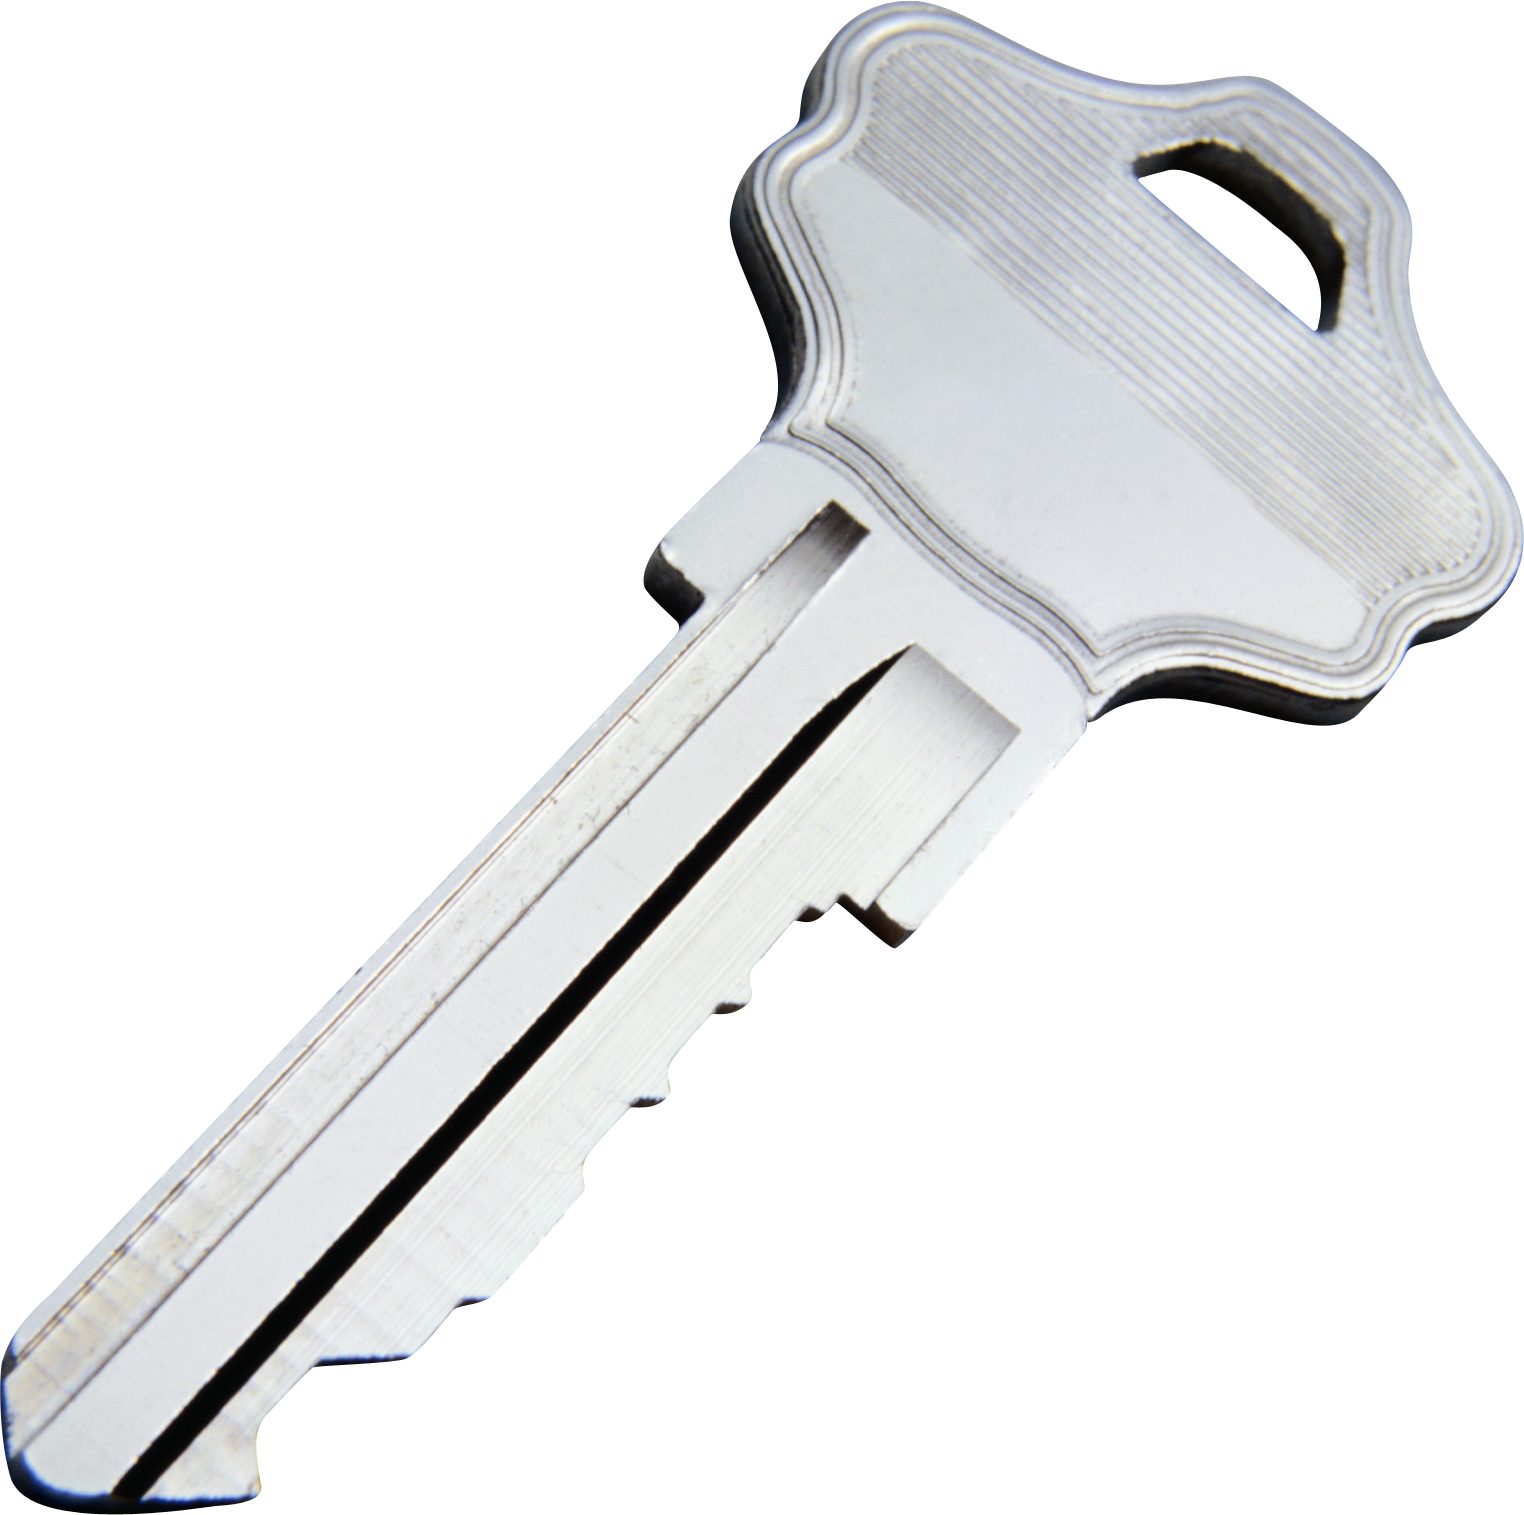 Key PNG - 22862